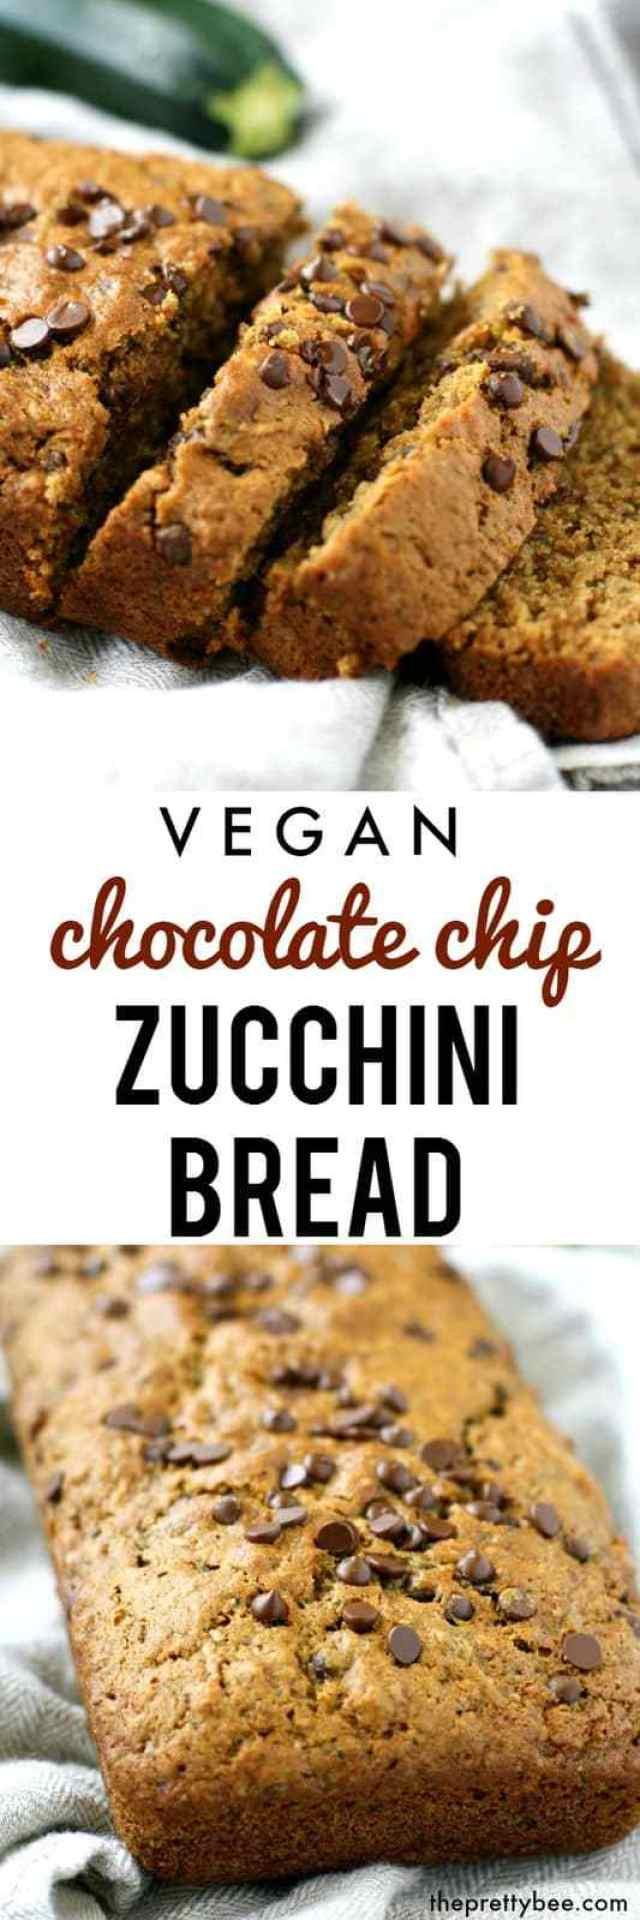 Vegan Chocolate Chip Zucchini Bread  Vegan Chocolate Chip Zucchini Bread The Pretty Bee